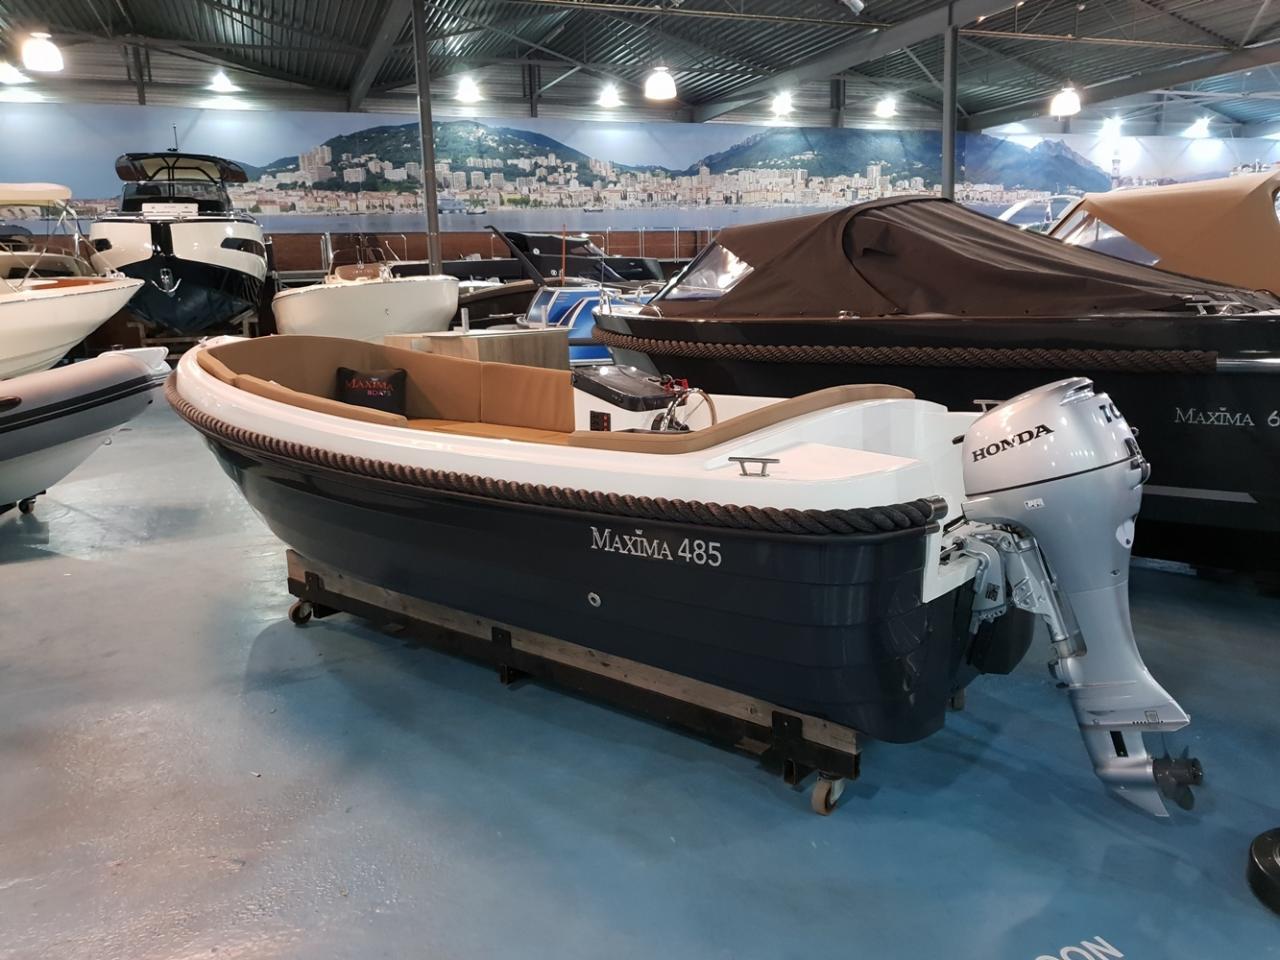 Maxima 485 met 10 pk Honda outboard motor 2